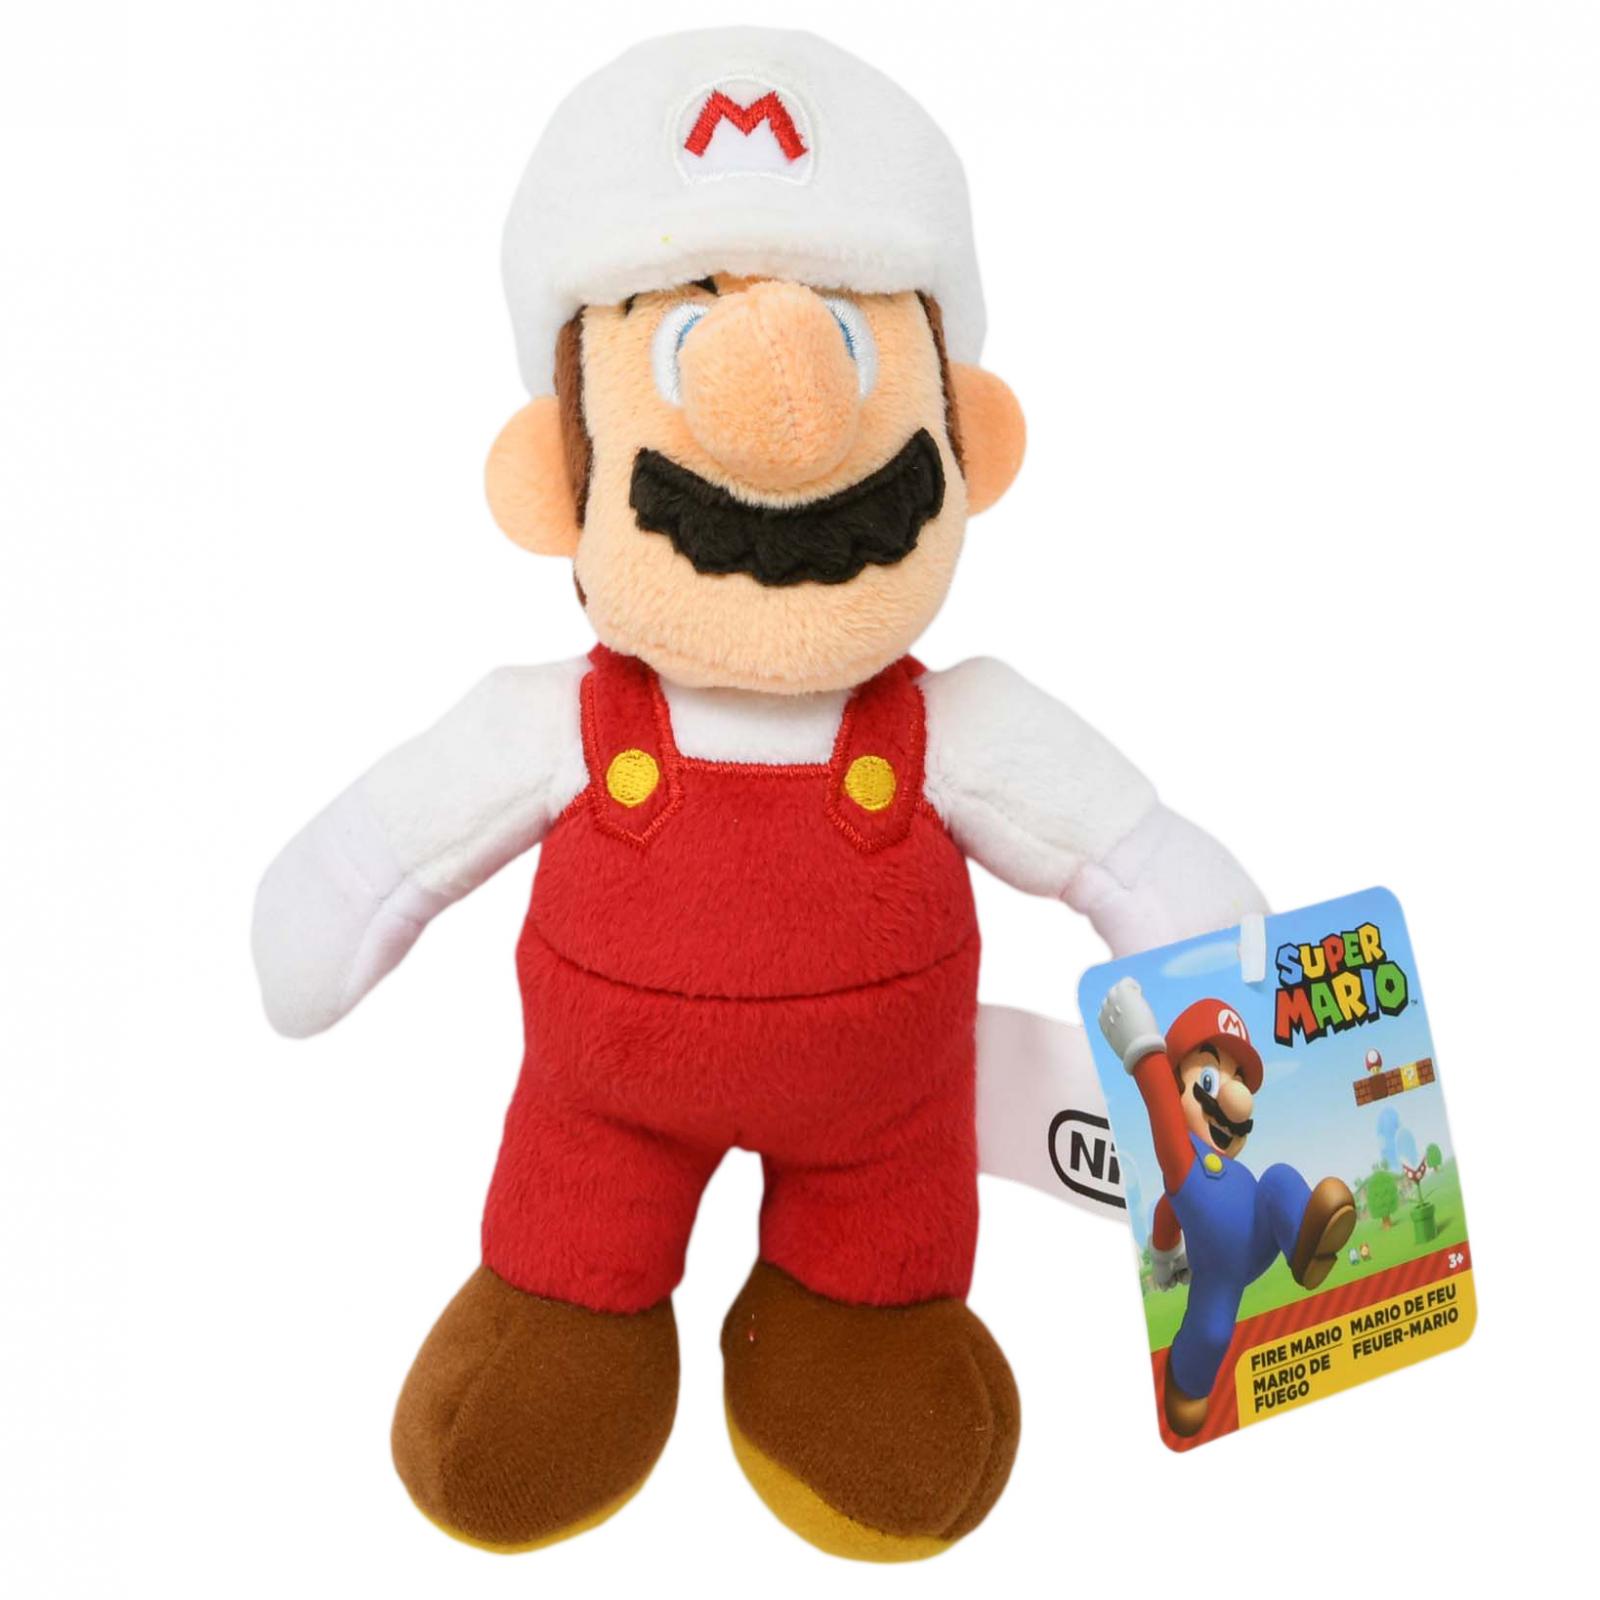 World of Nintendo Super Mario Plush Toy 7.5 Inch Fire Mario